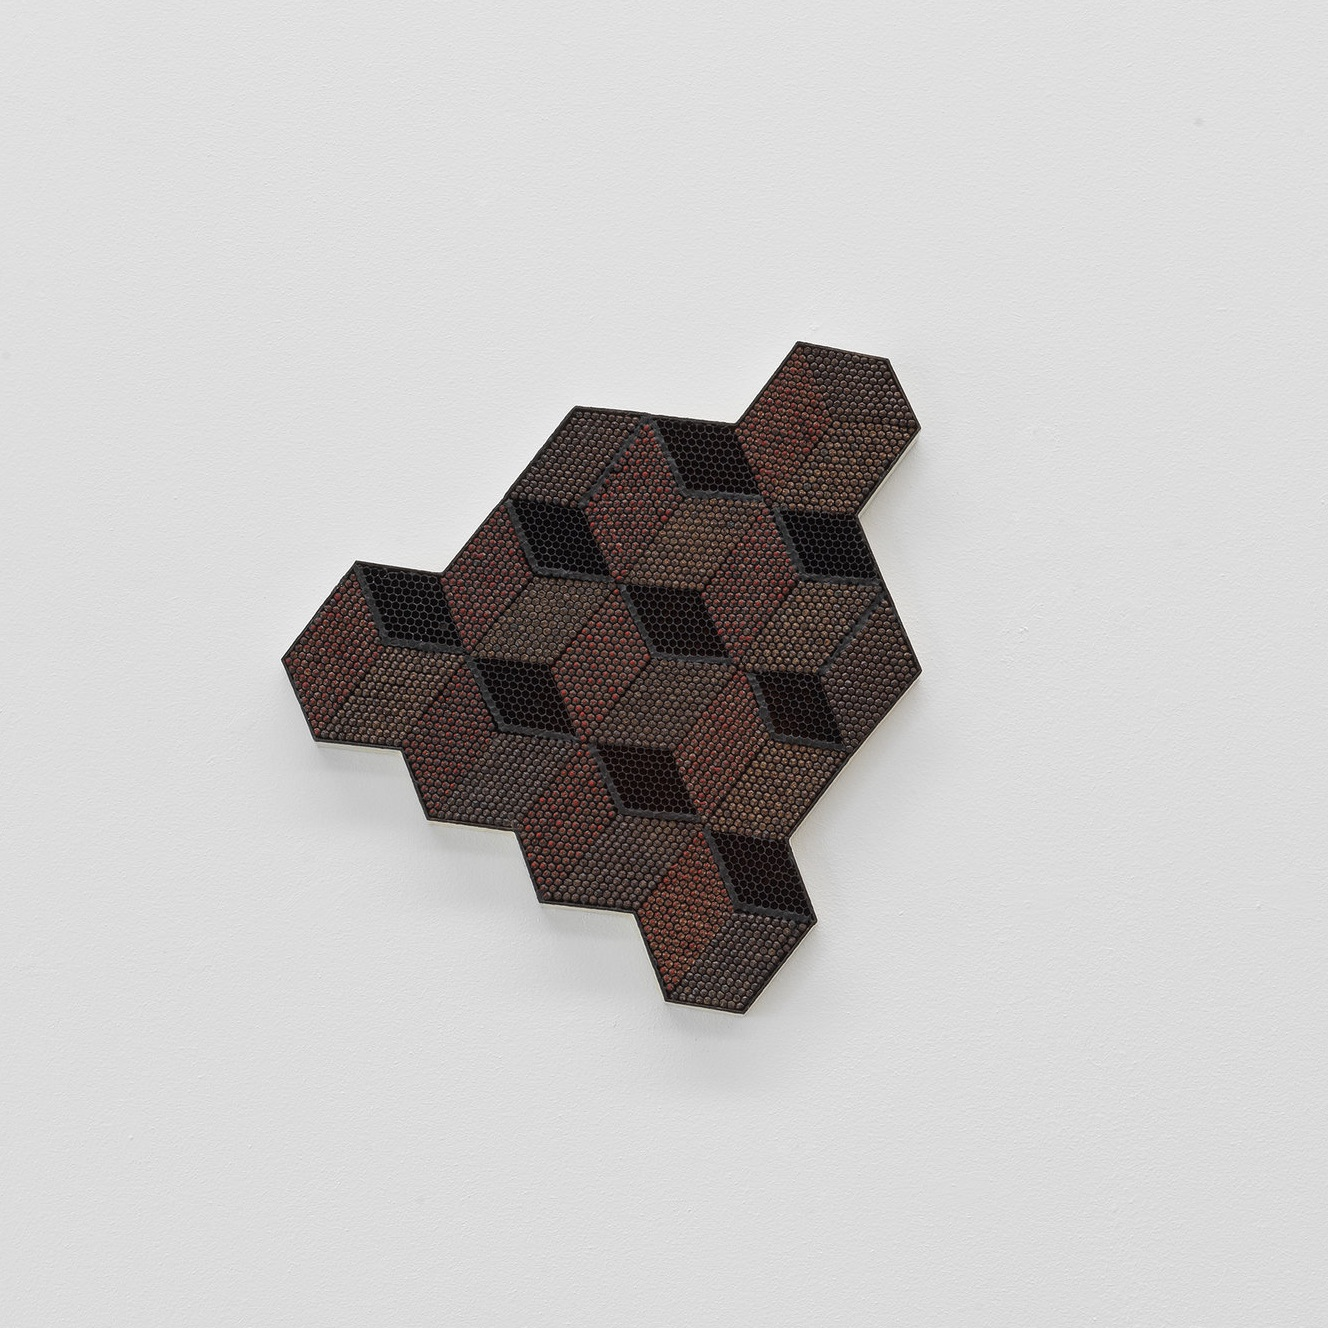 Arnold Holzknecht, Nummer elf, 2019, honeycomb, 42 x 37 cm